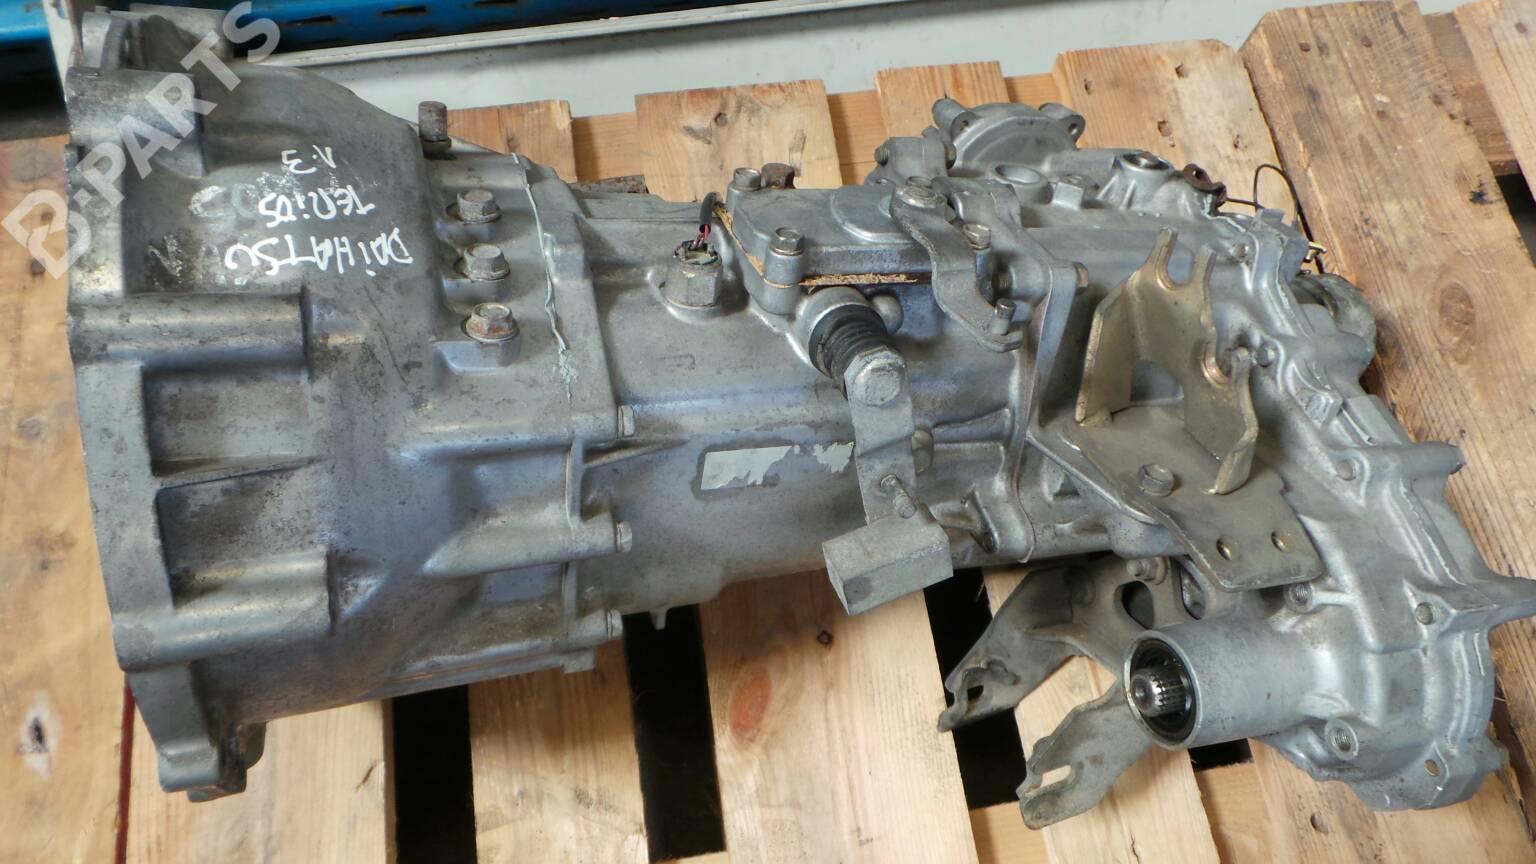 Manual Gearbox DAIHATSU, TERIOS (J1_) 1.3 4WD (J100) (83hp) ...